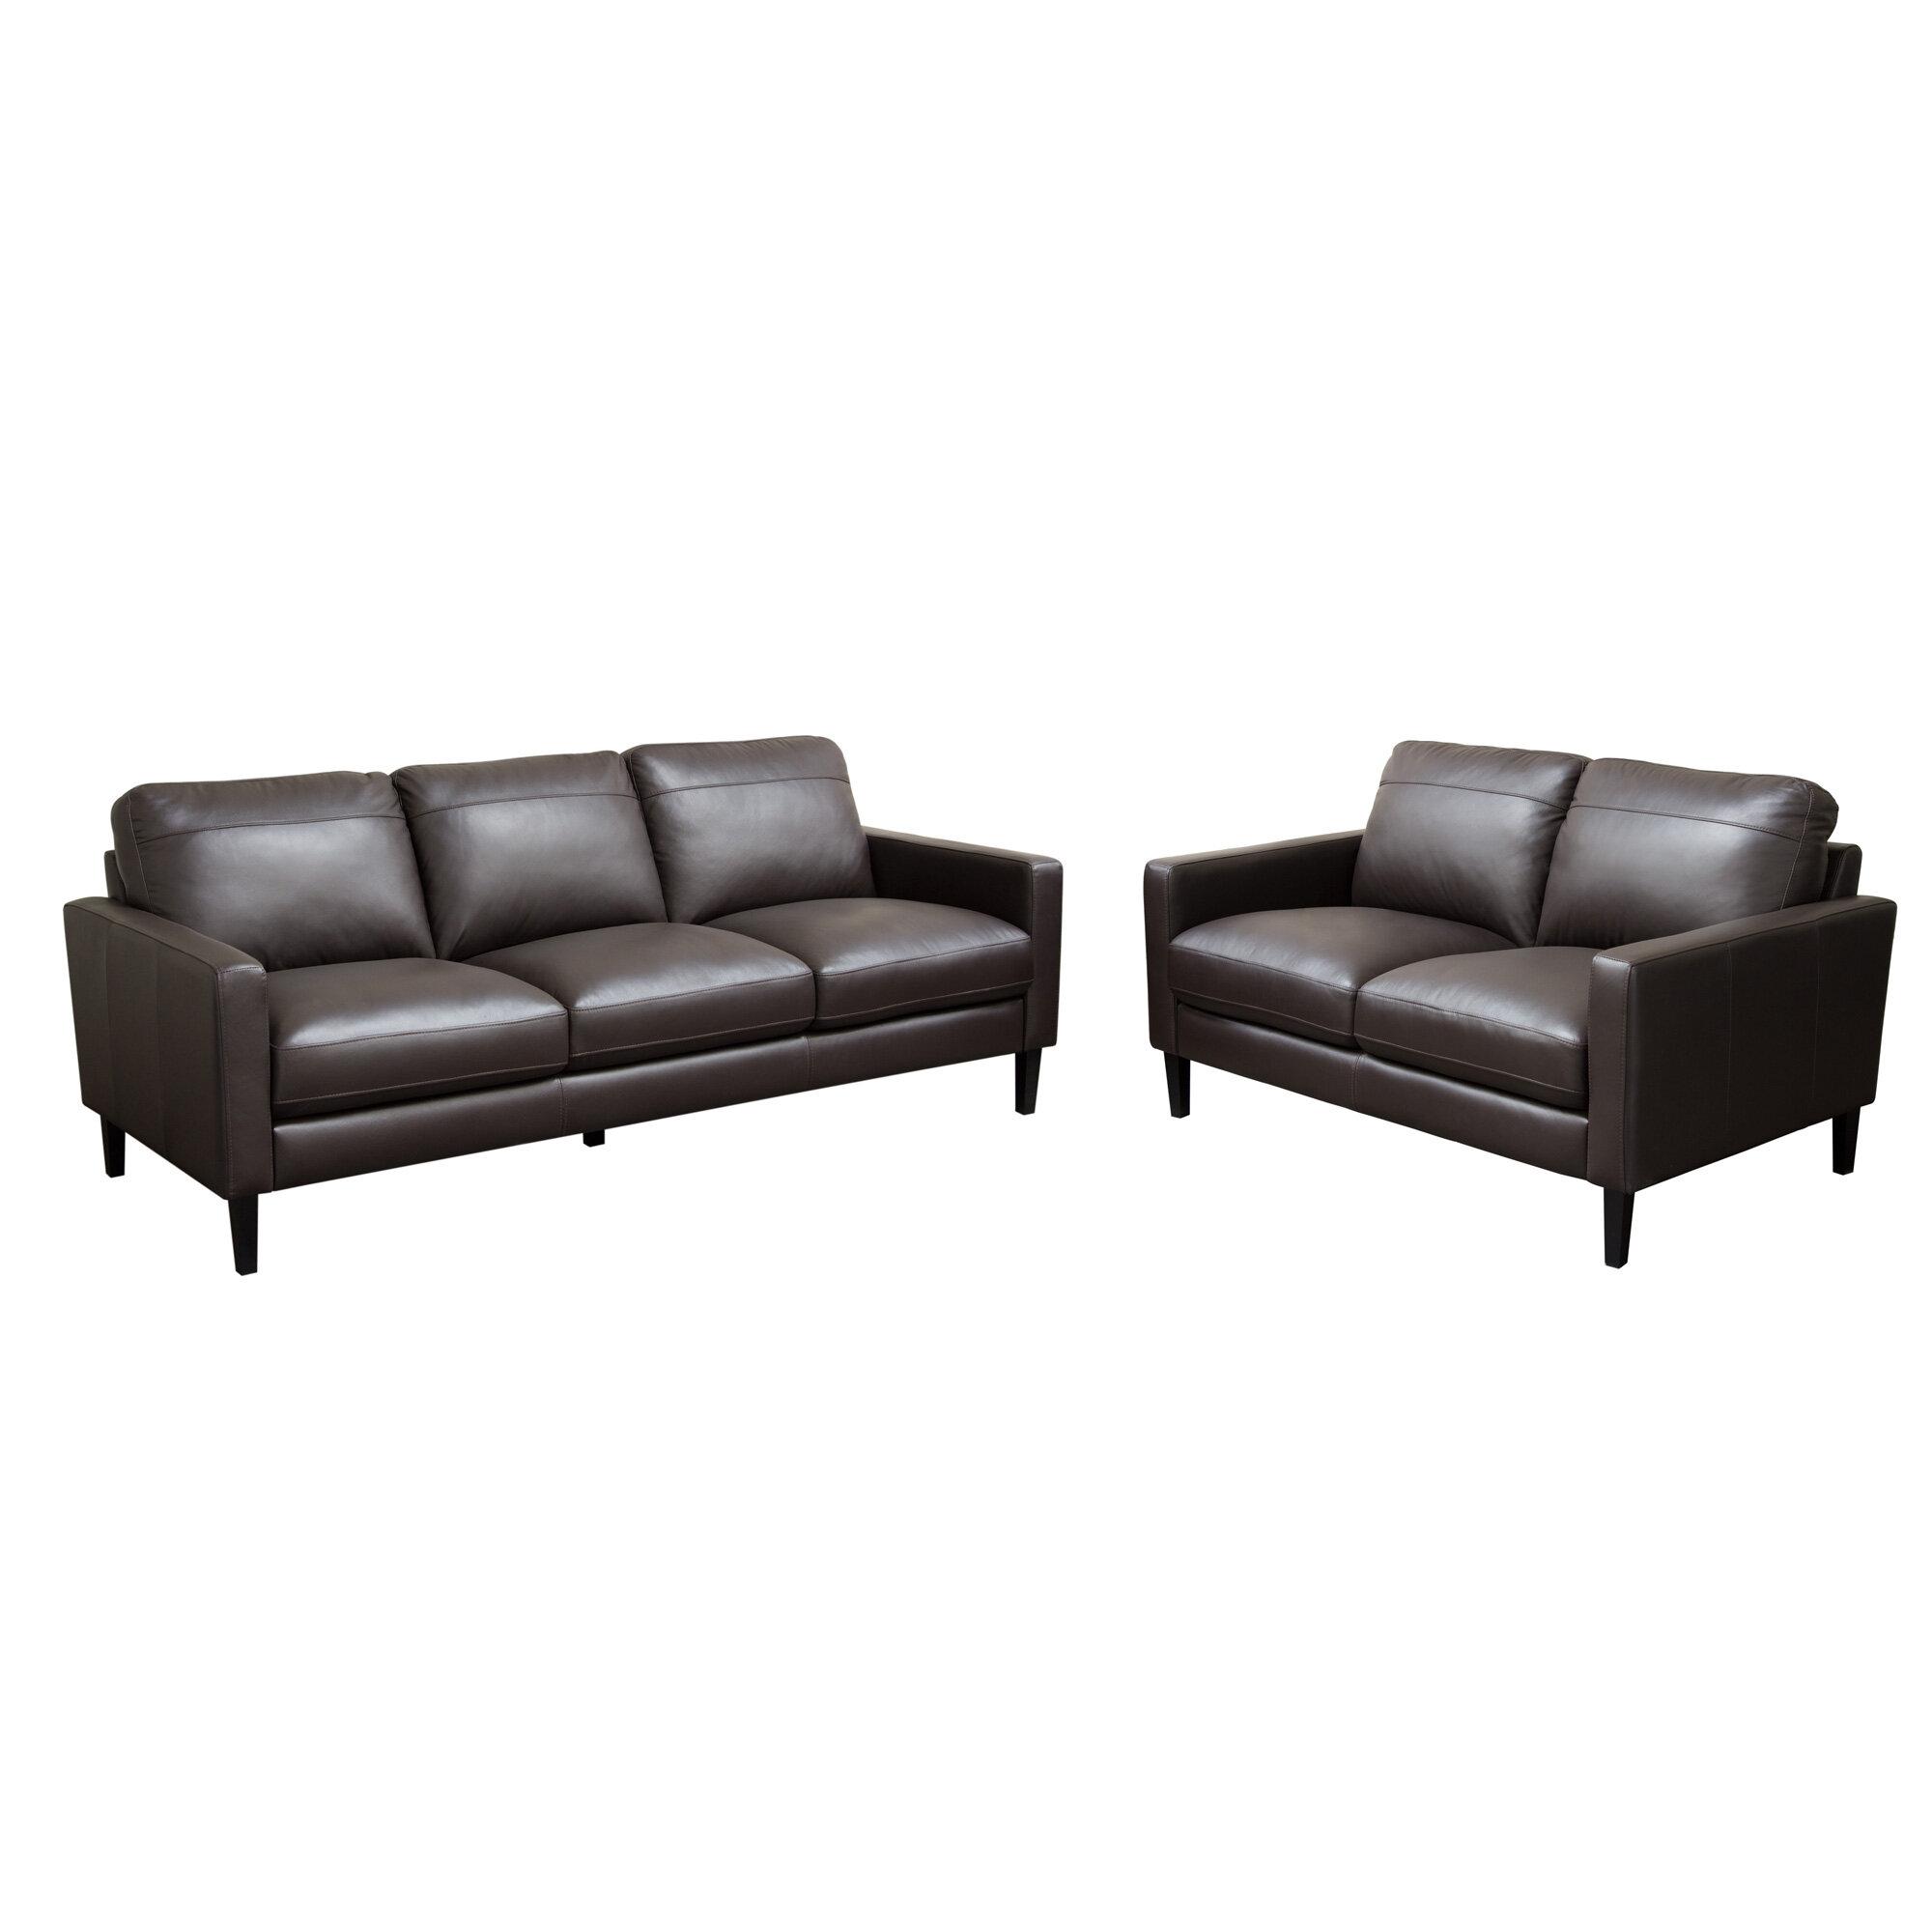 Diamond Sofa Omega Configurable Living Room Set & Reviews | Wayfair